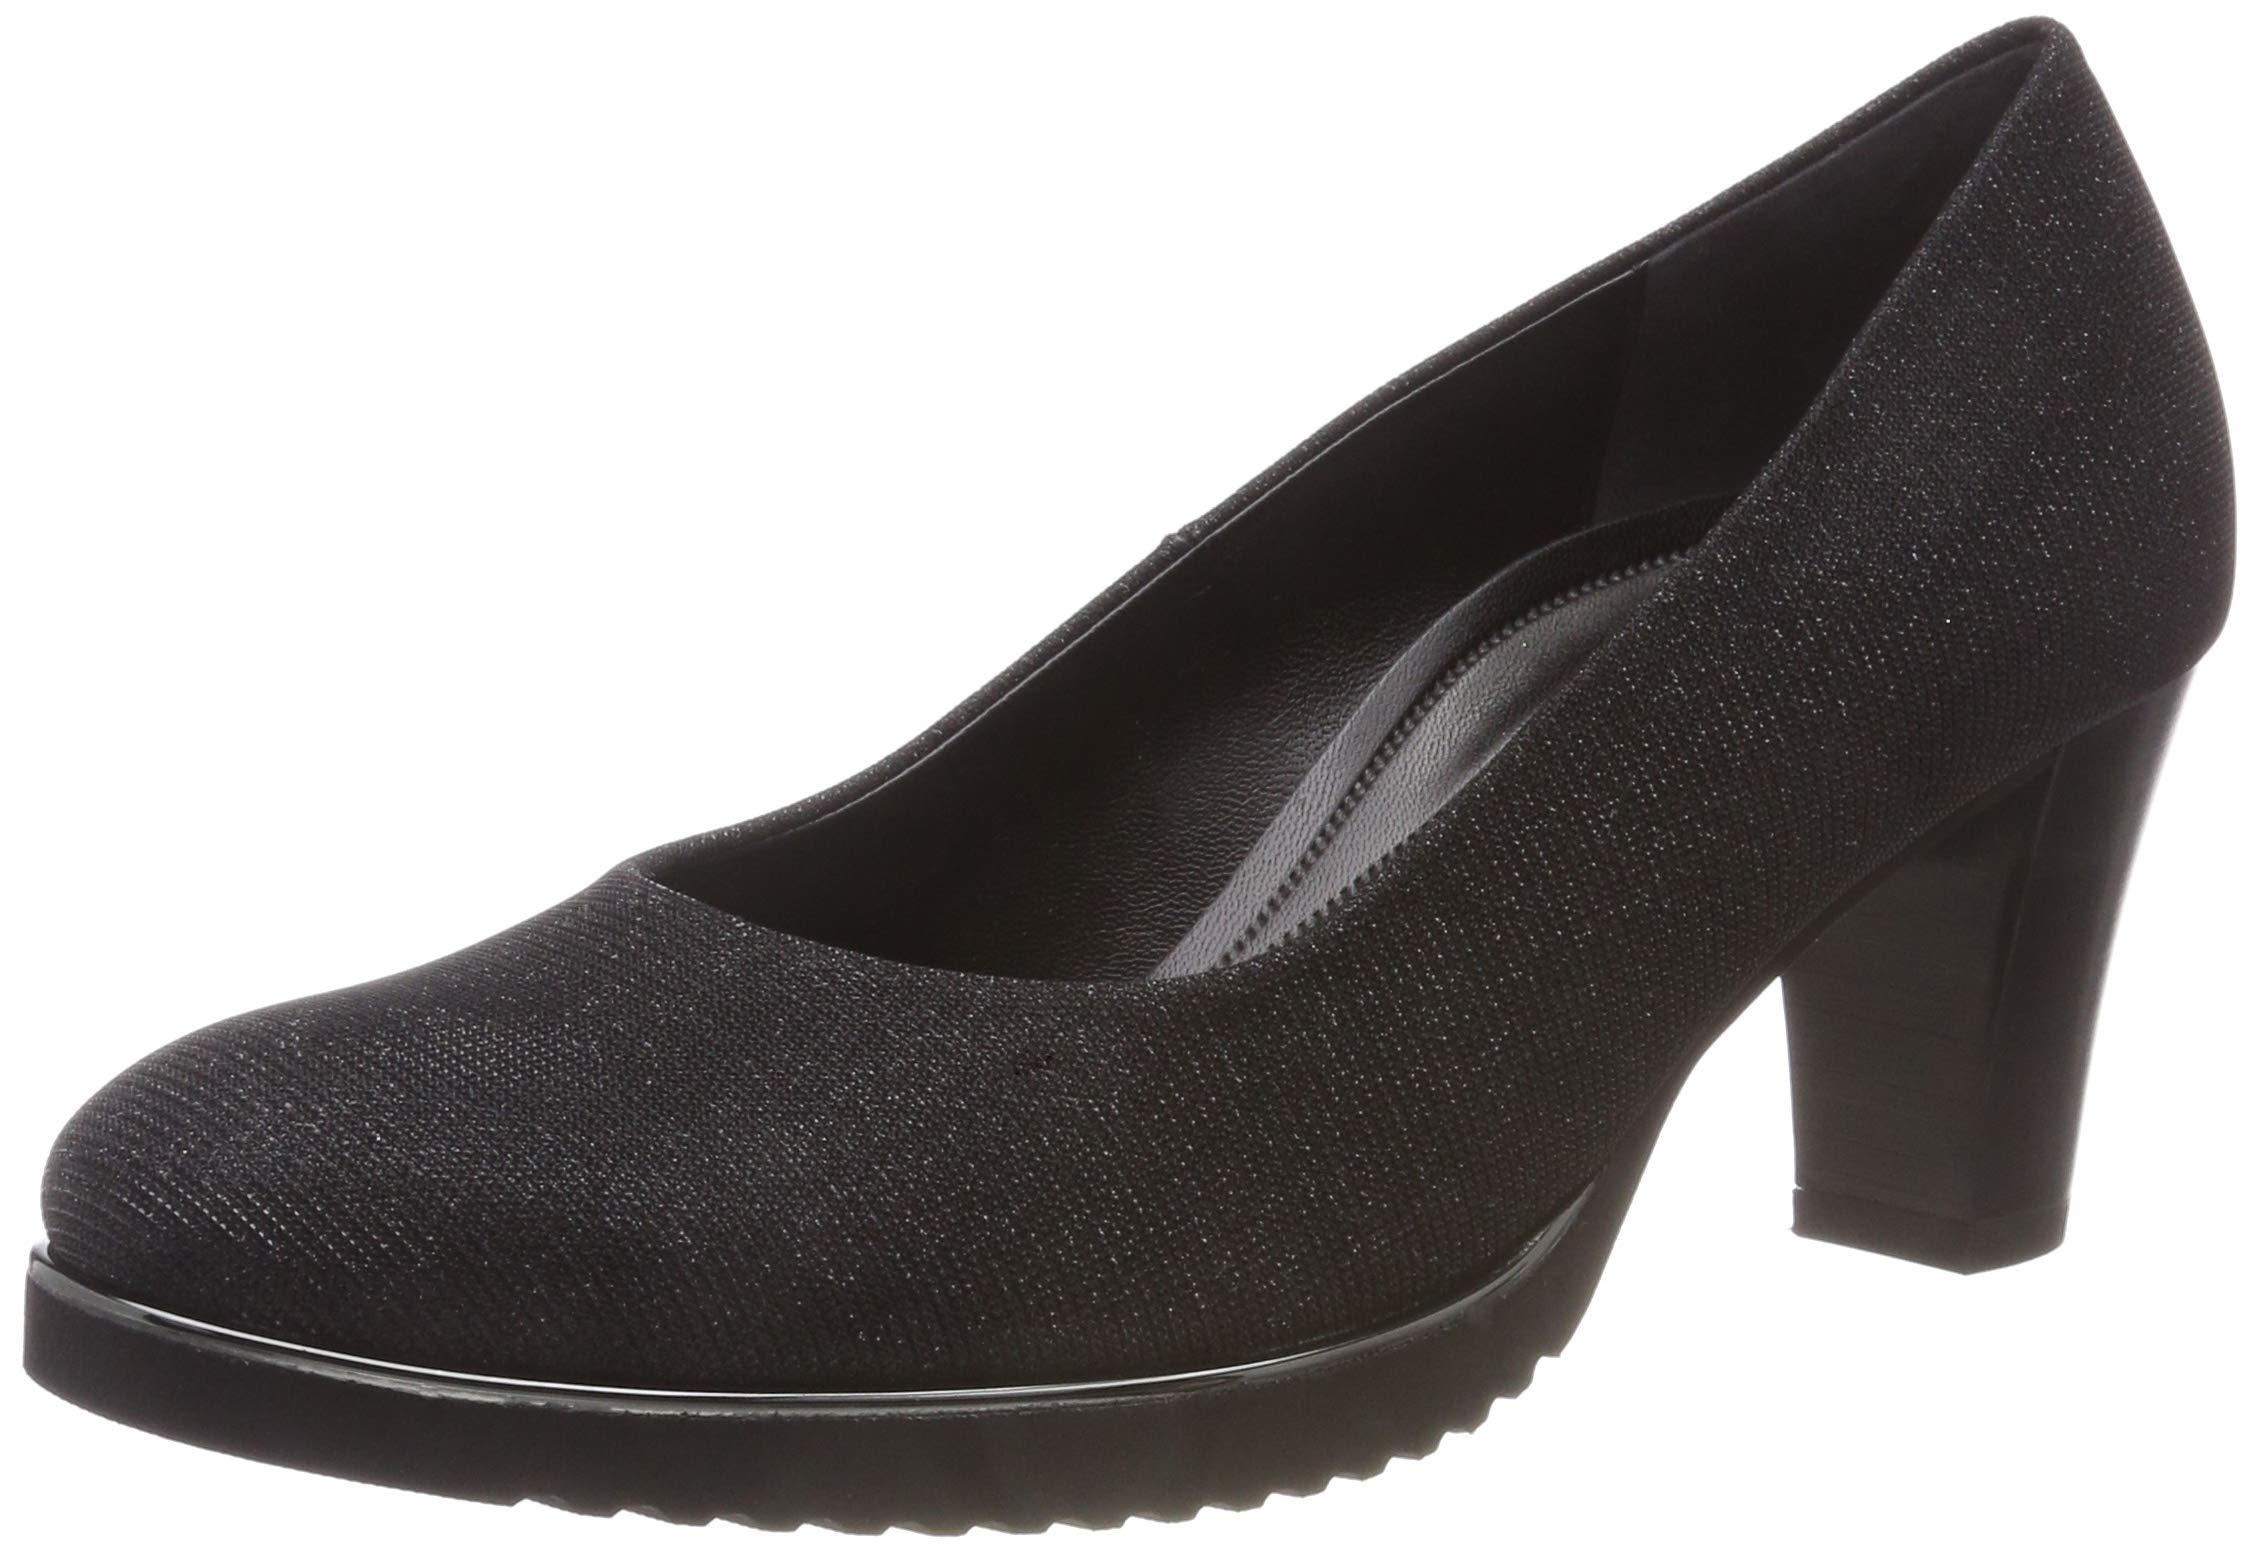 Gabor FemmeNoirschwarz Eu a s Shoes a s1740 s Comfort FashionEscarpins NwOm0v8n